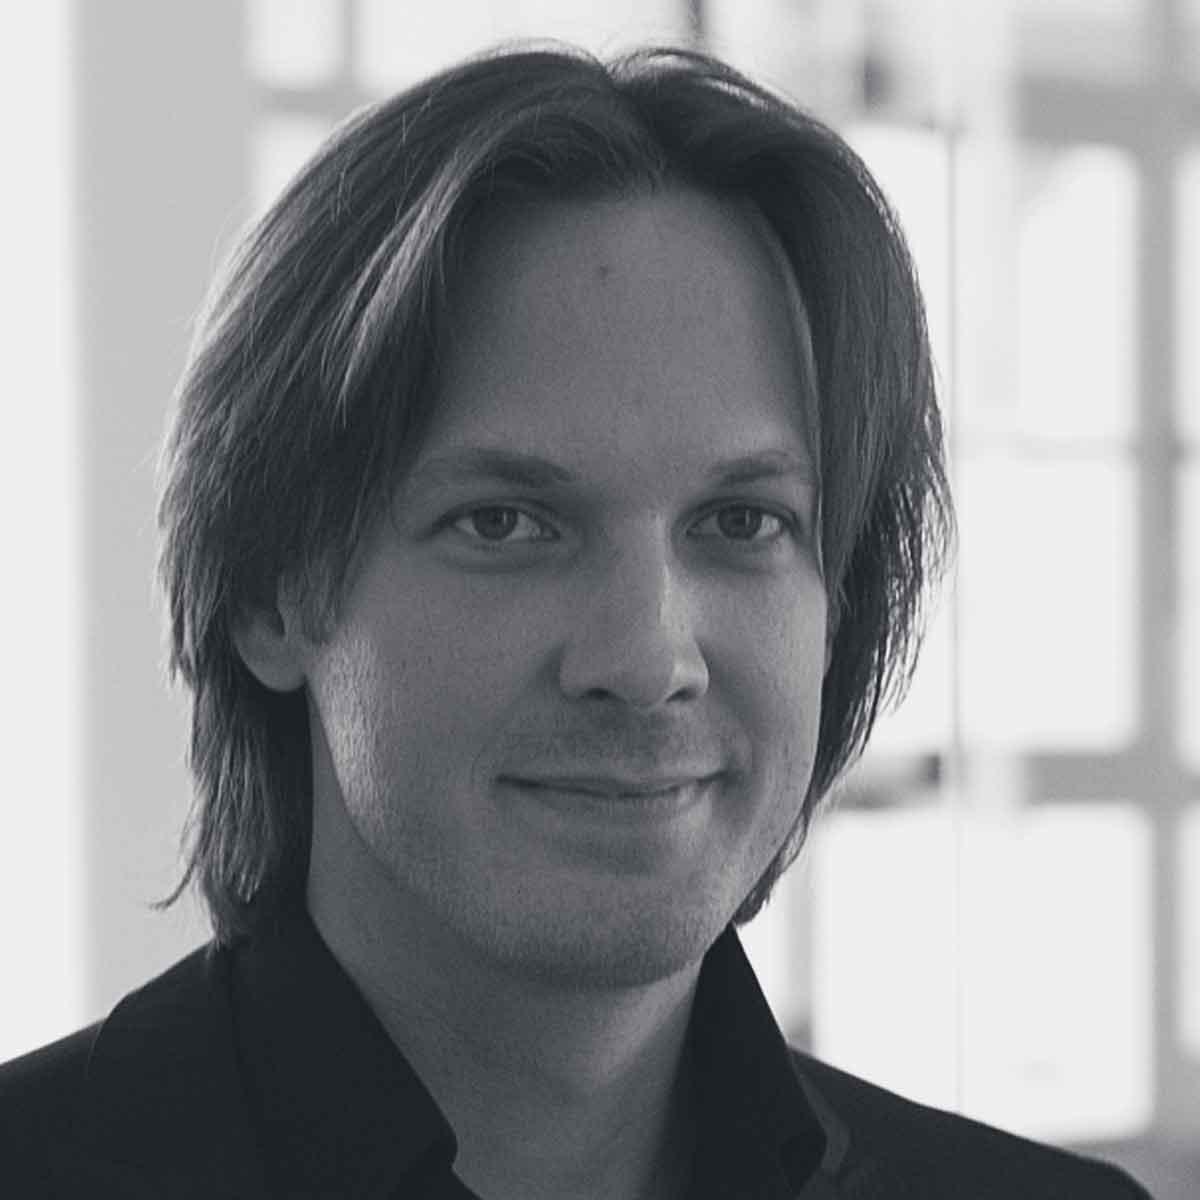 Markus Wagner